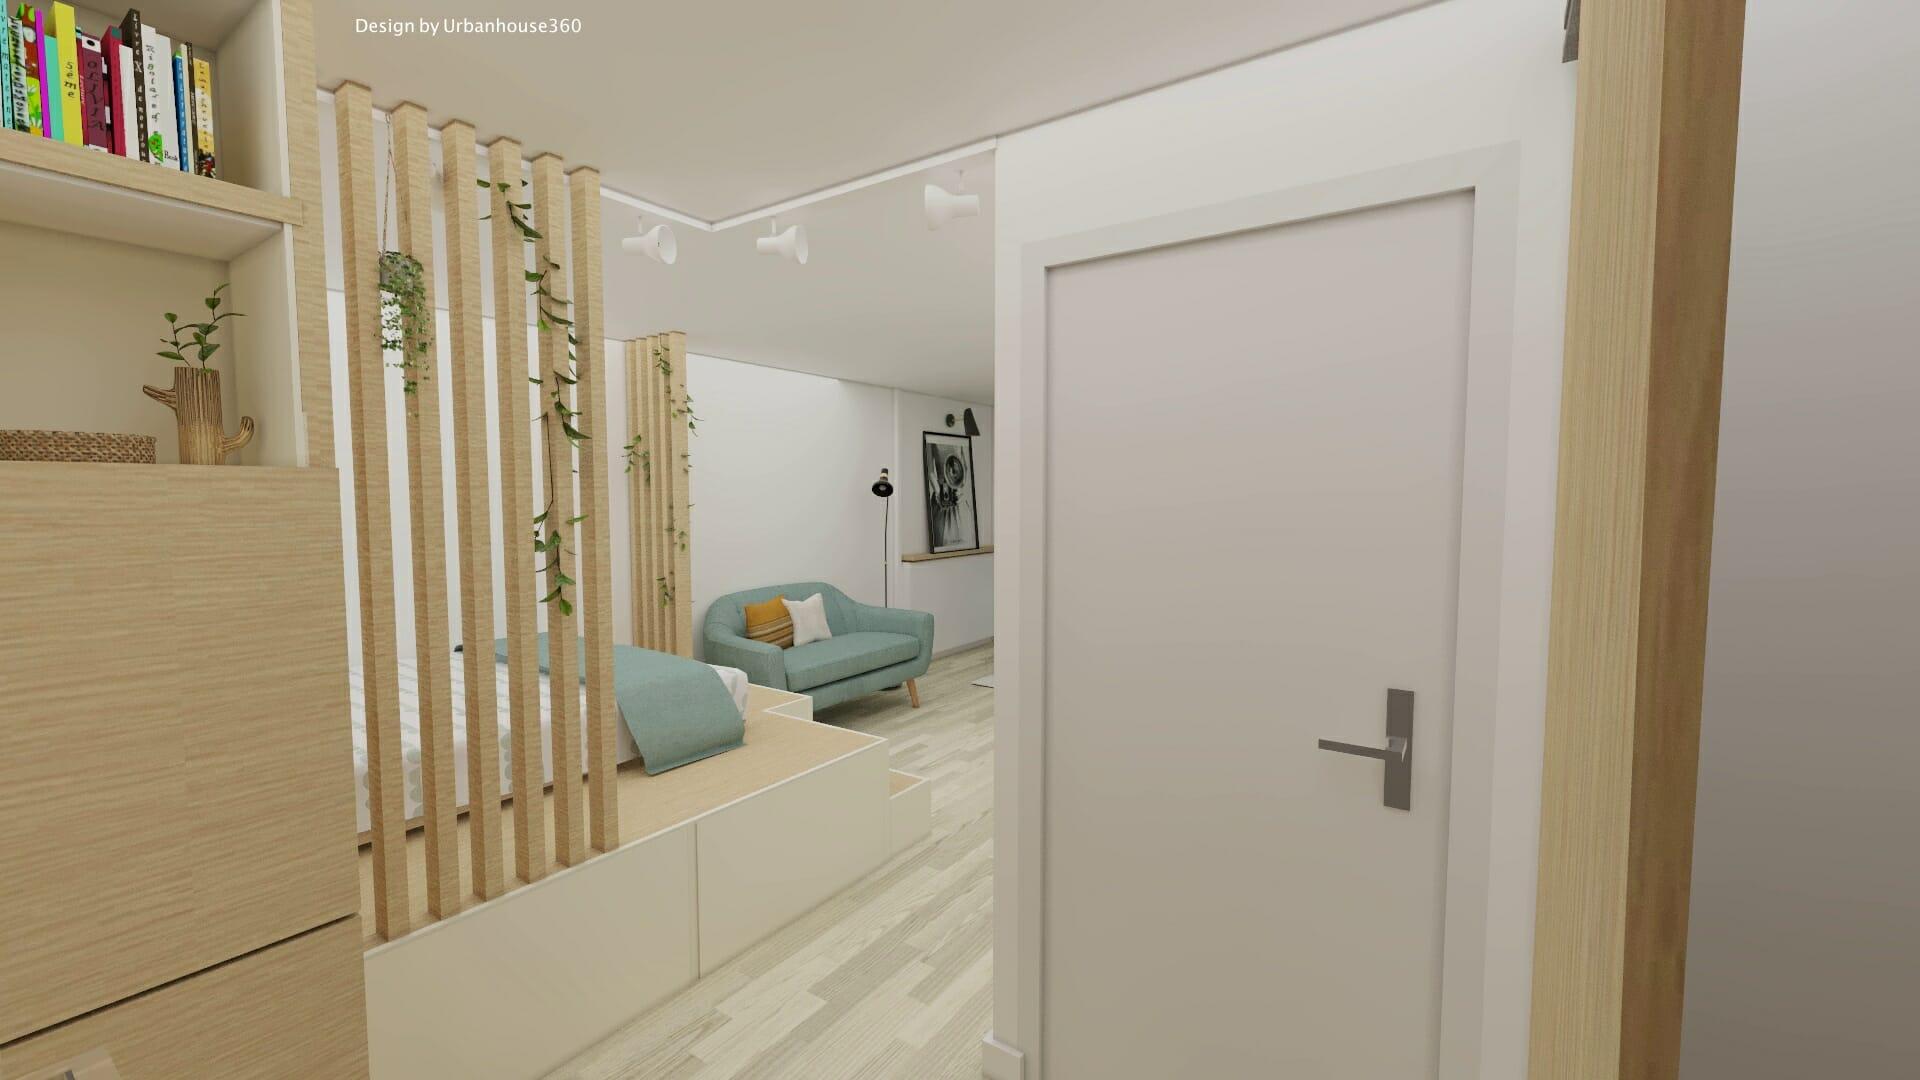 Urbanhouse360-Archachon-Redesign